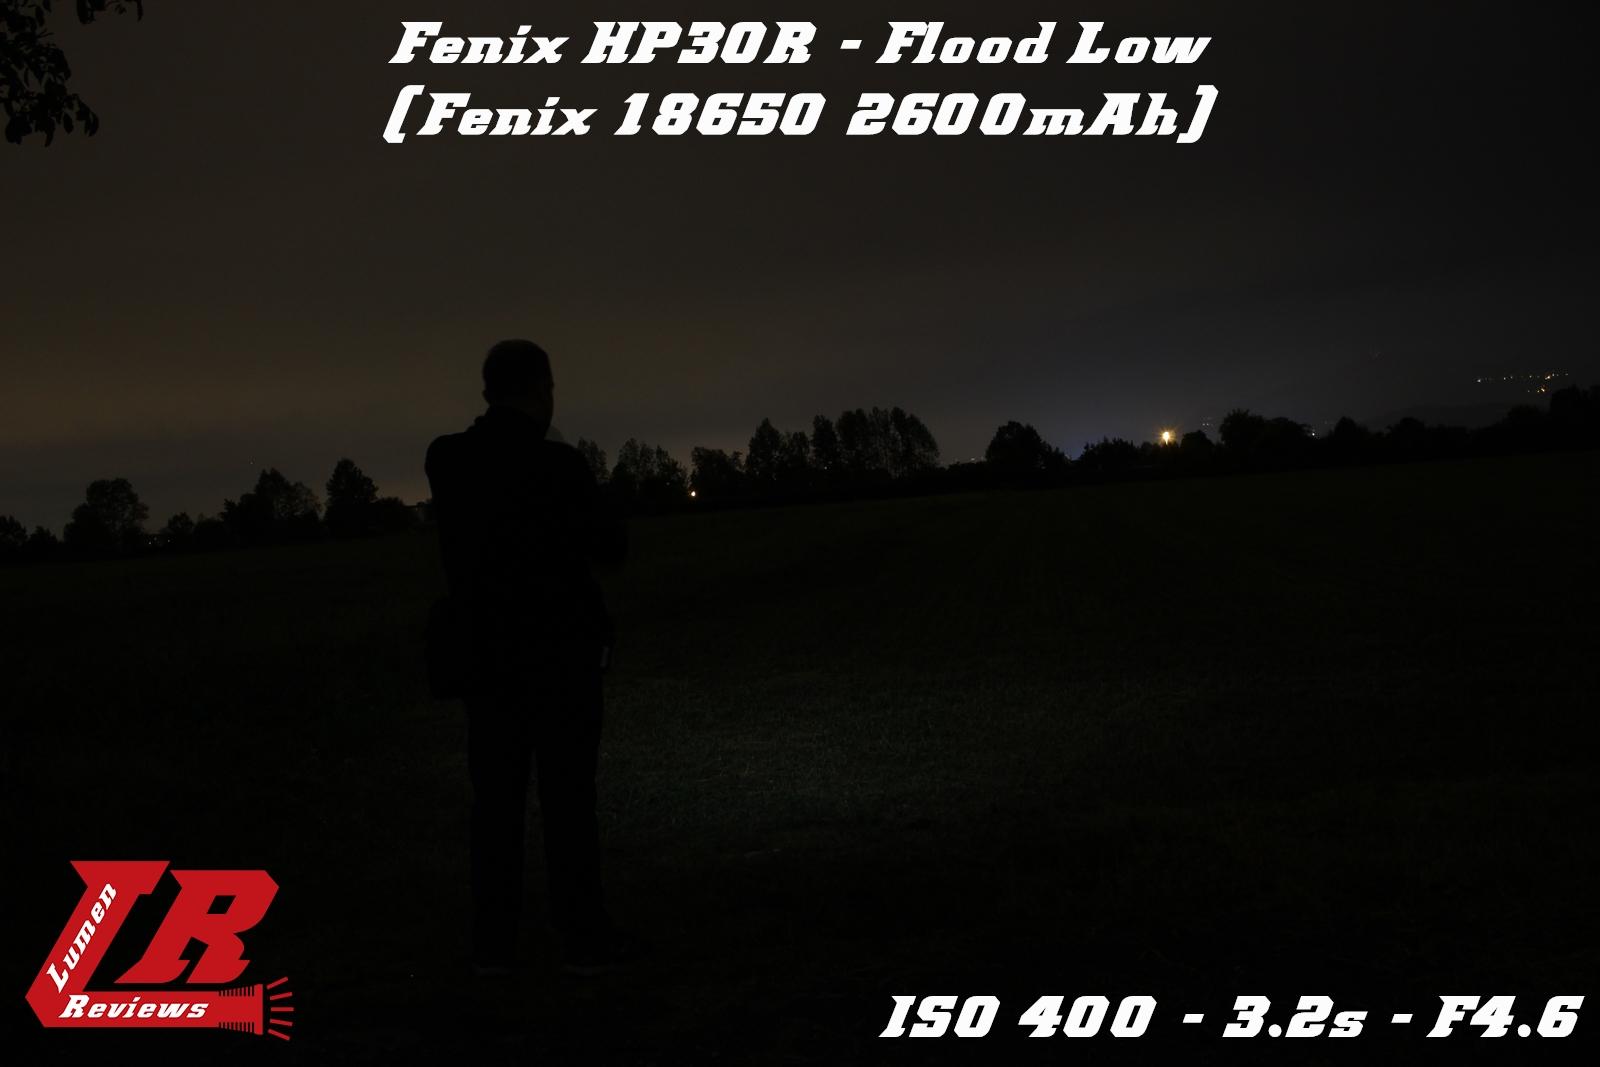 Fenix HP30R 20